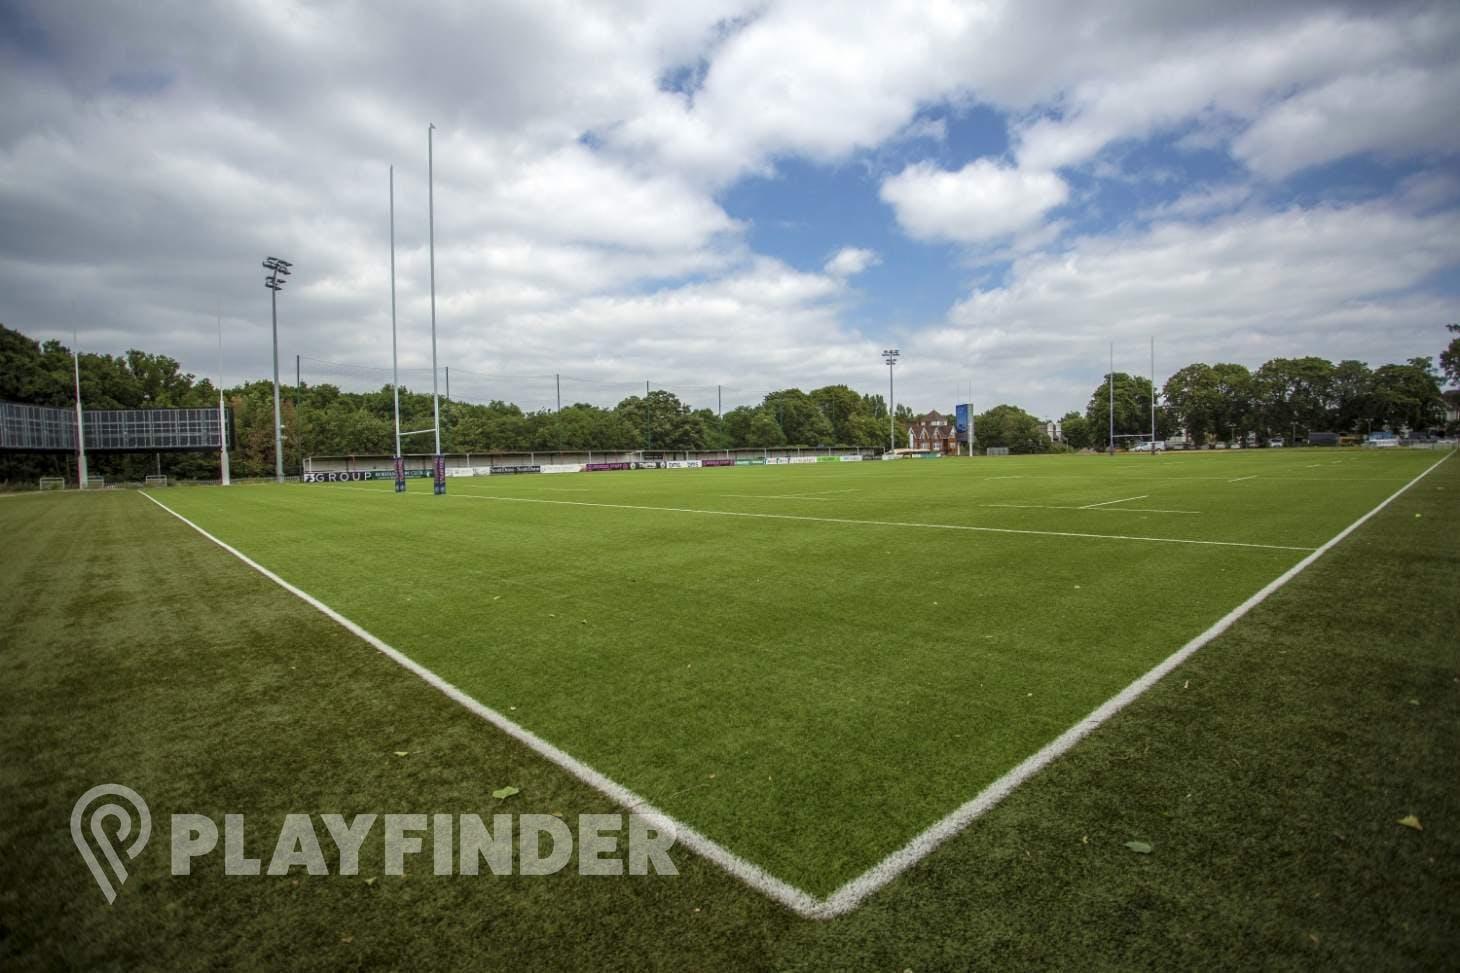 Rosslyn Park Rugby Club 7 a side | 3G Astroturf football pitch